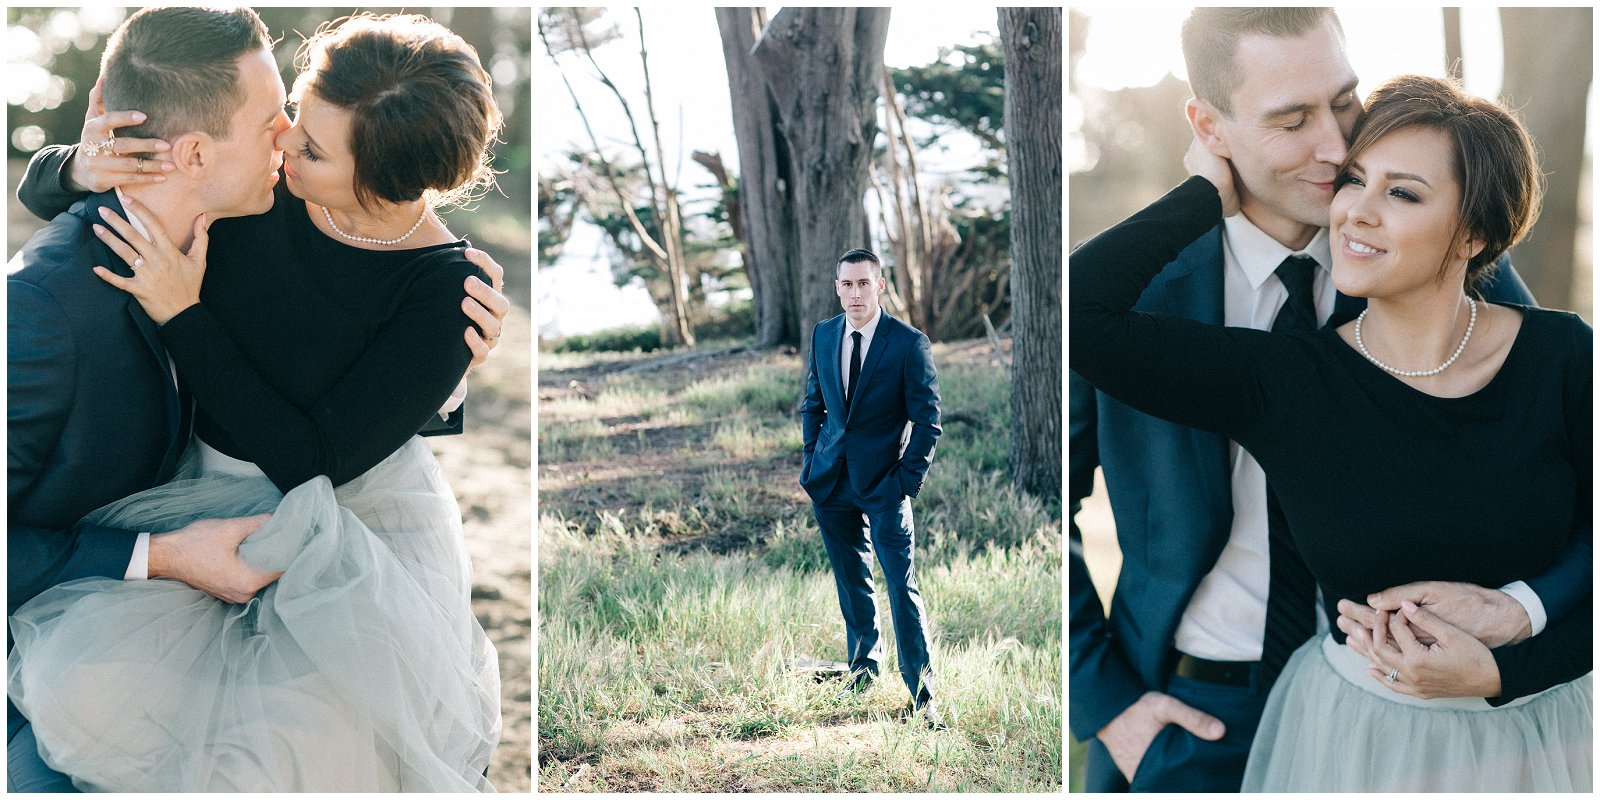 San-Francisco-Bay-Area-Wedding-Photography-Engagment-Session-2.jpg